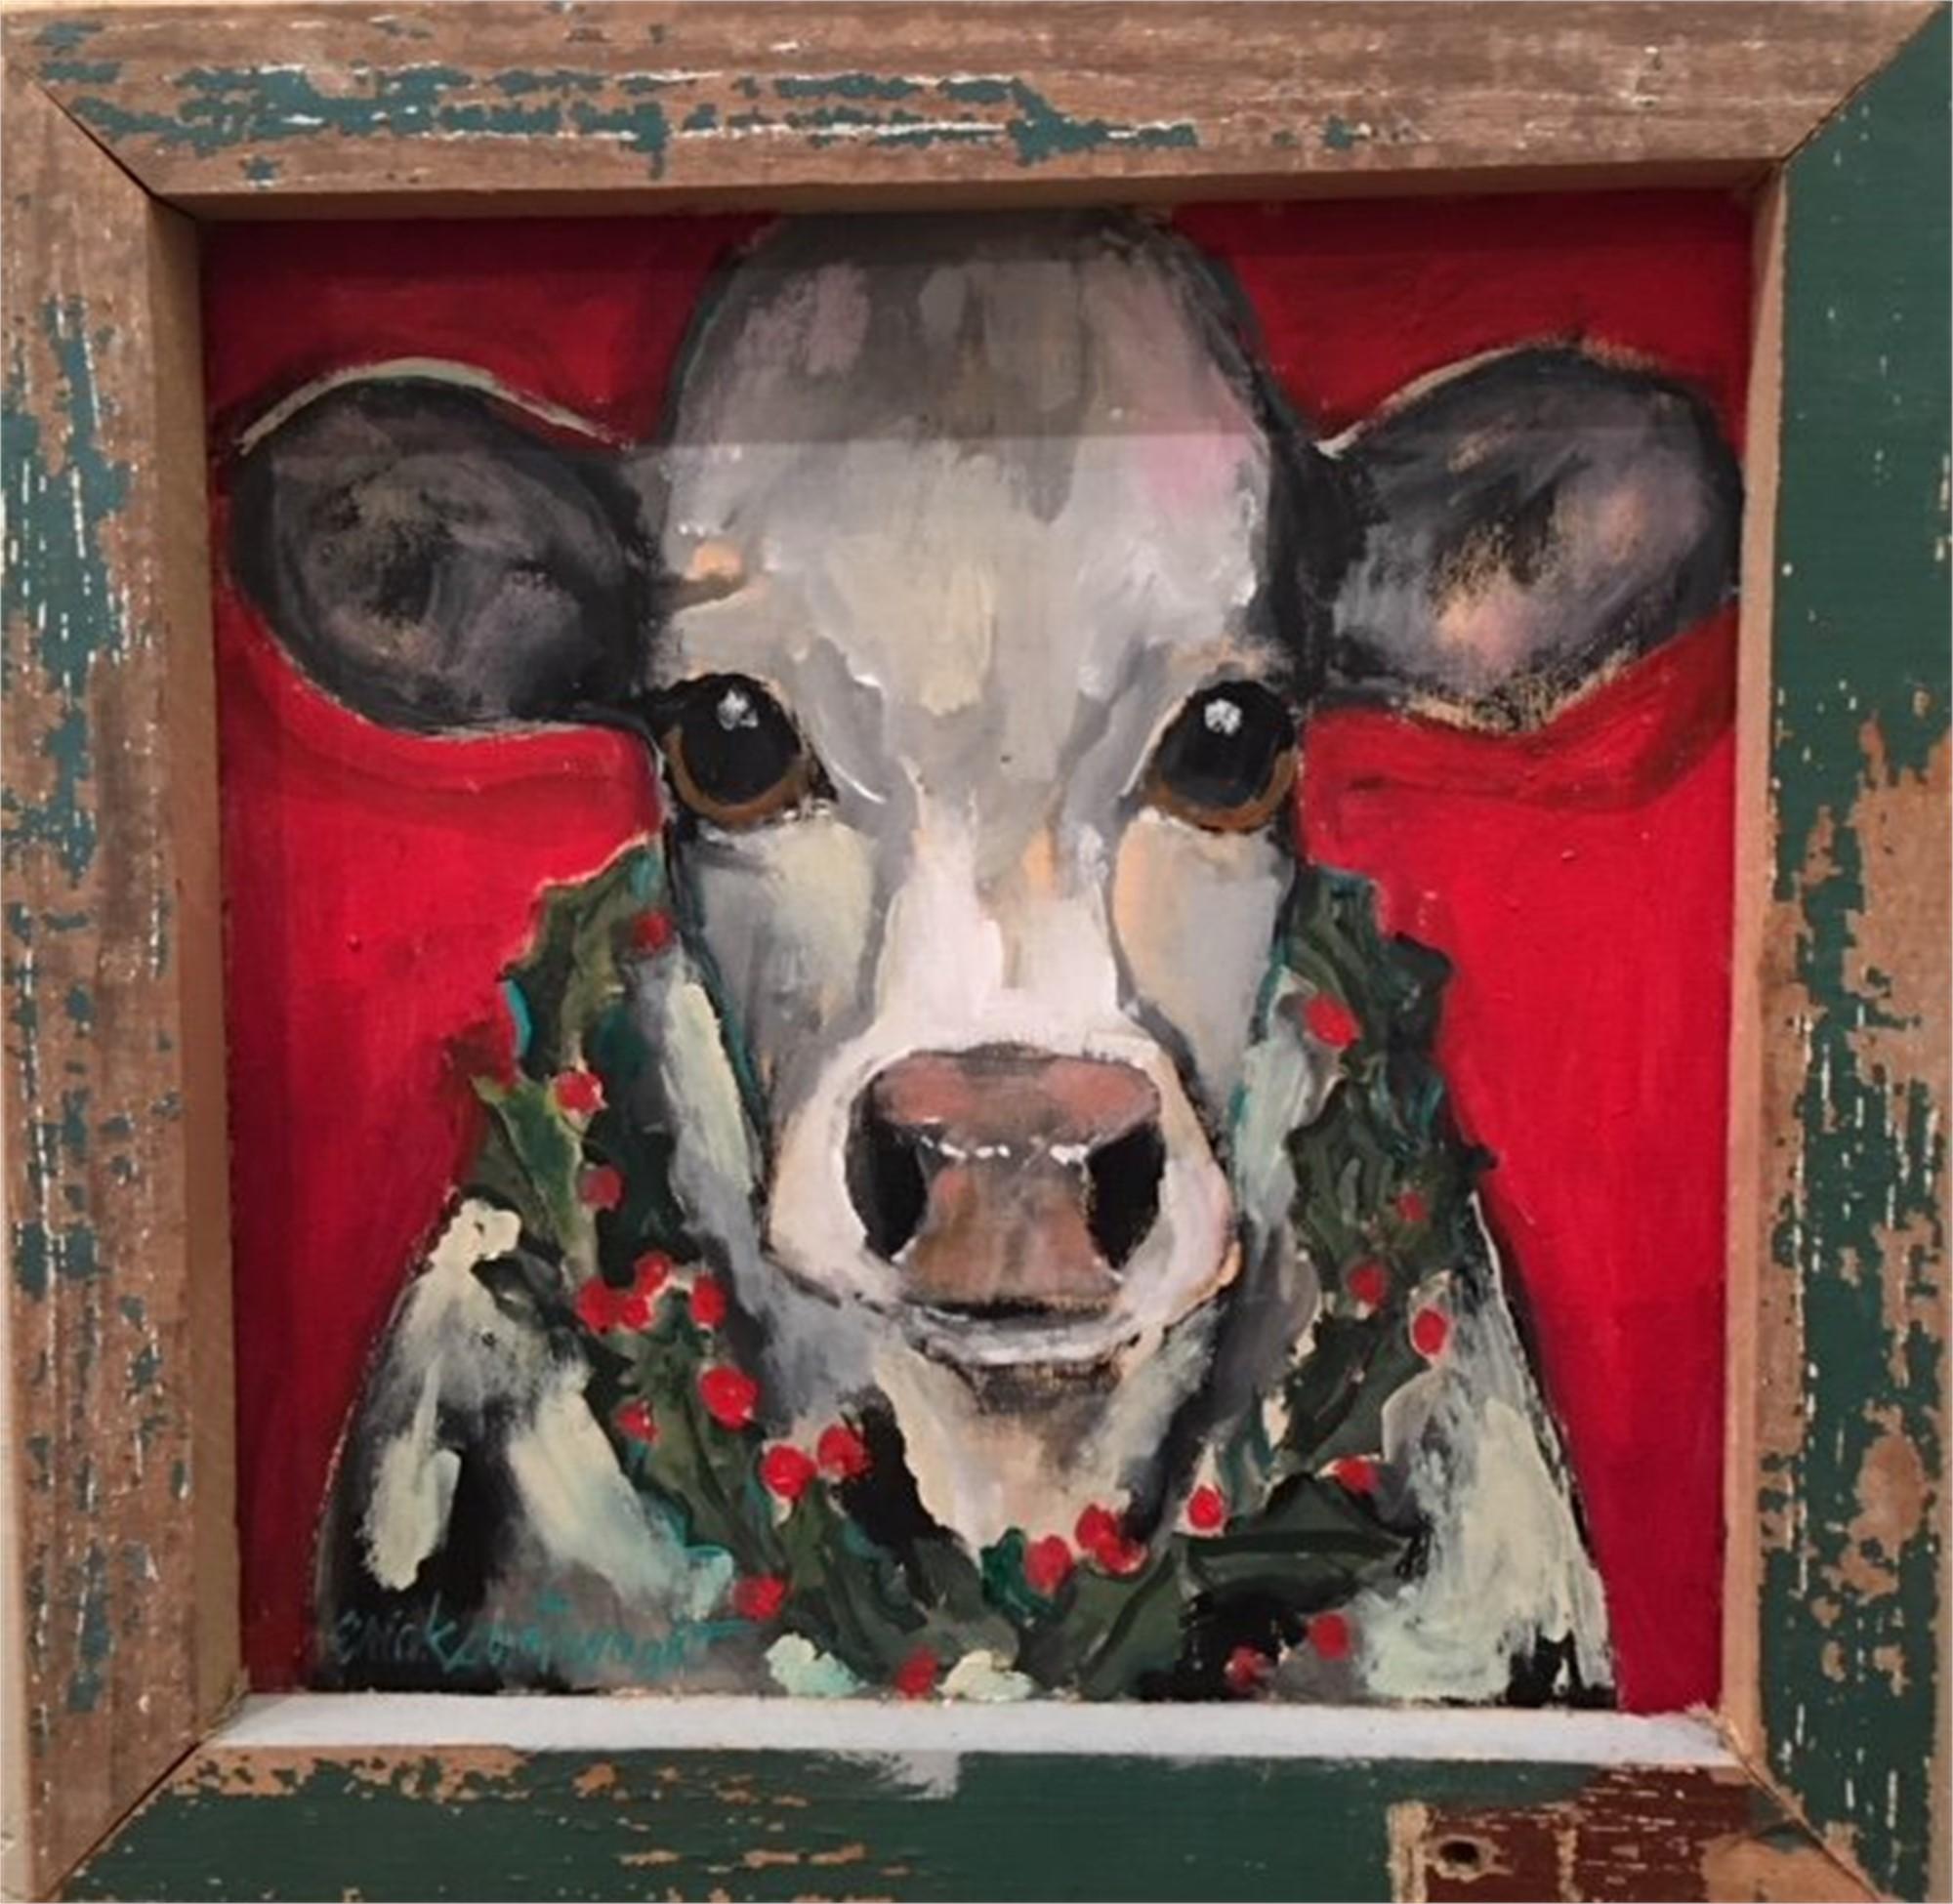 Making Merry by Sandra Erickson Wright